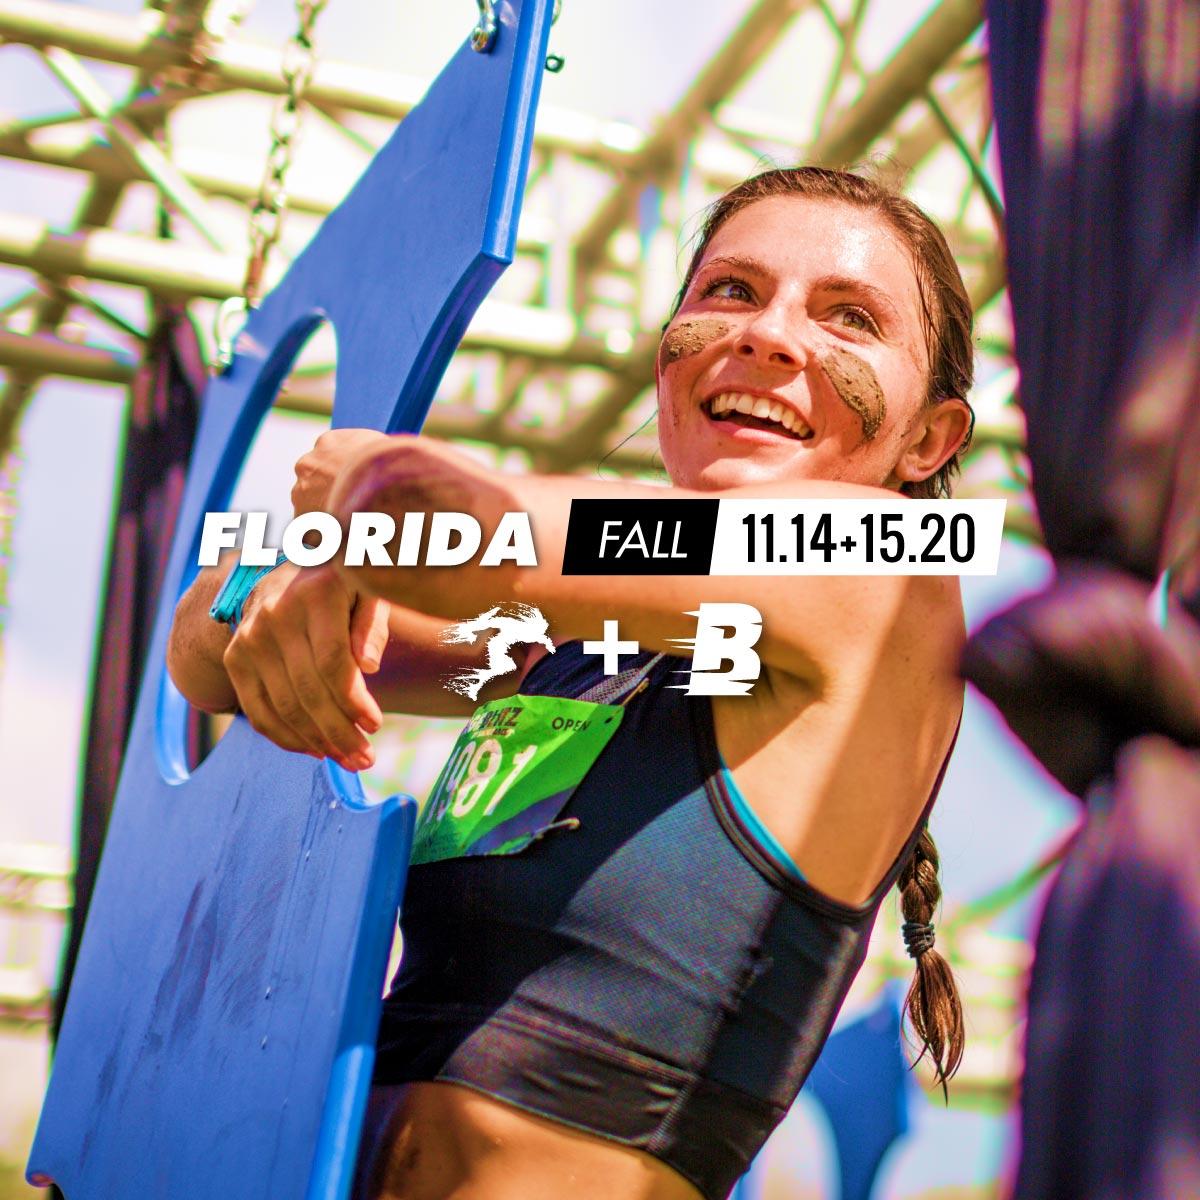 Florida Fall 2020